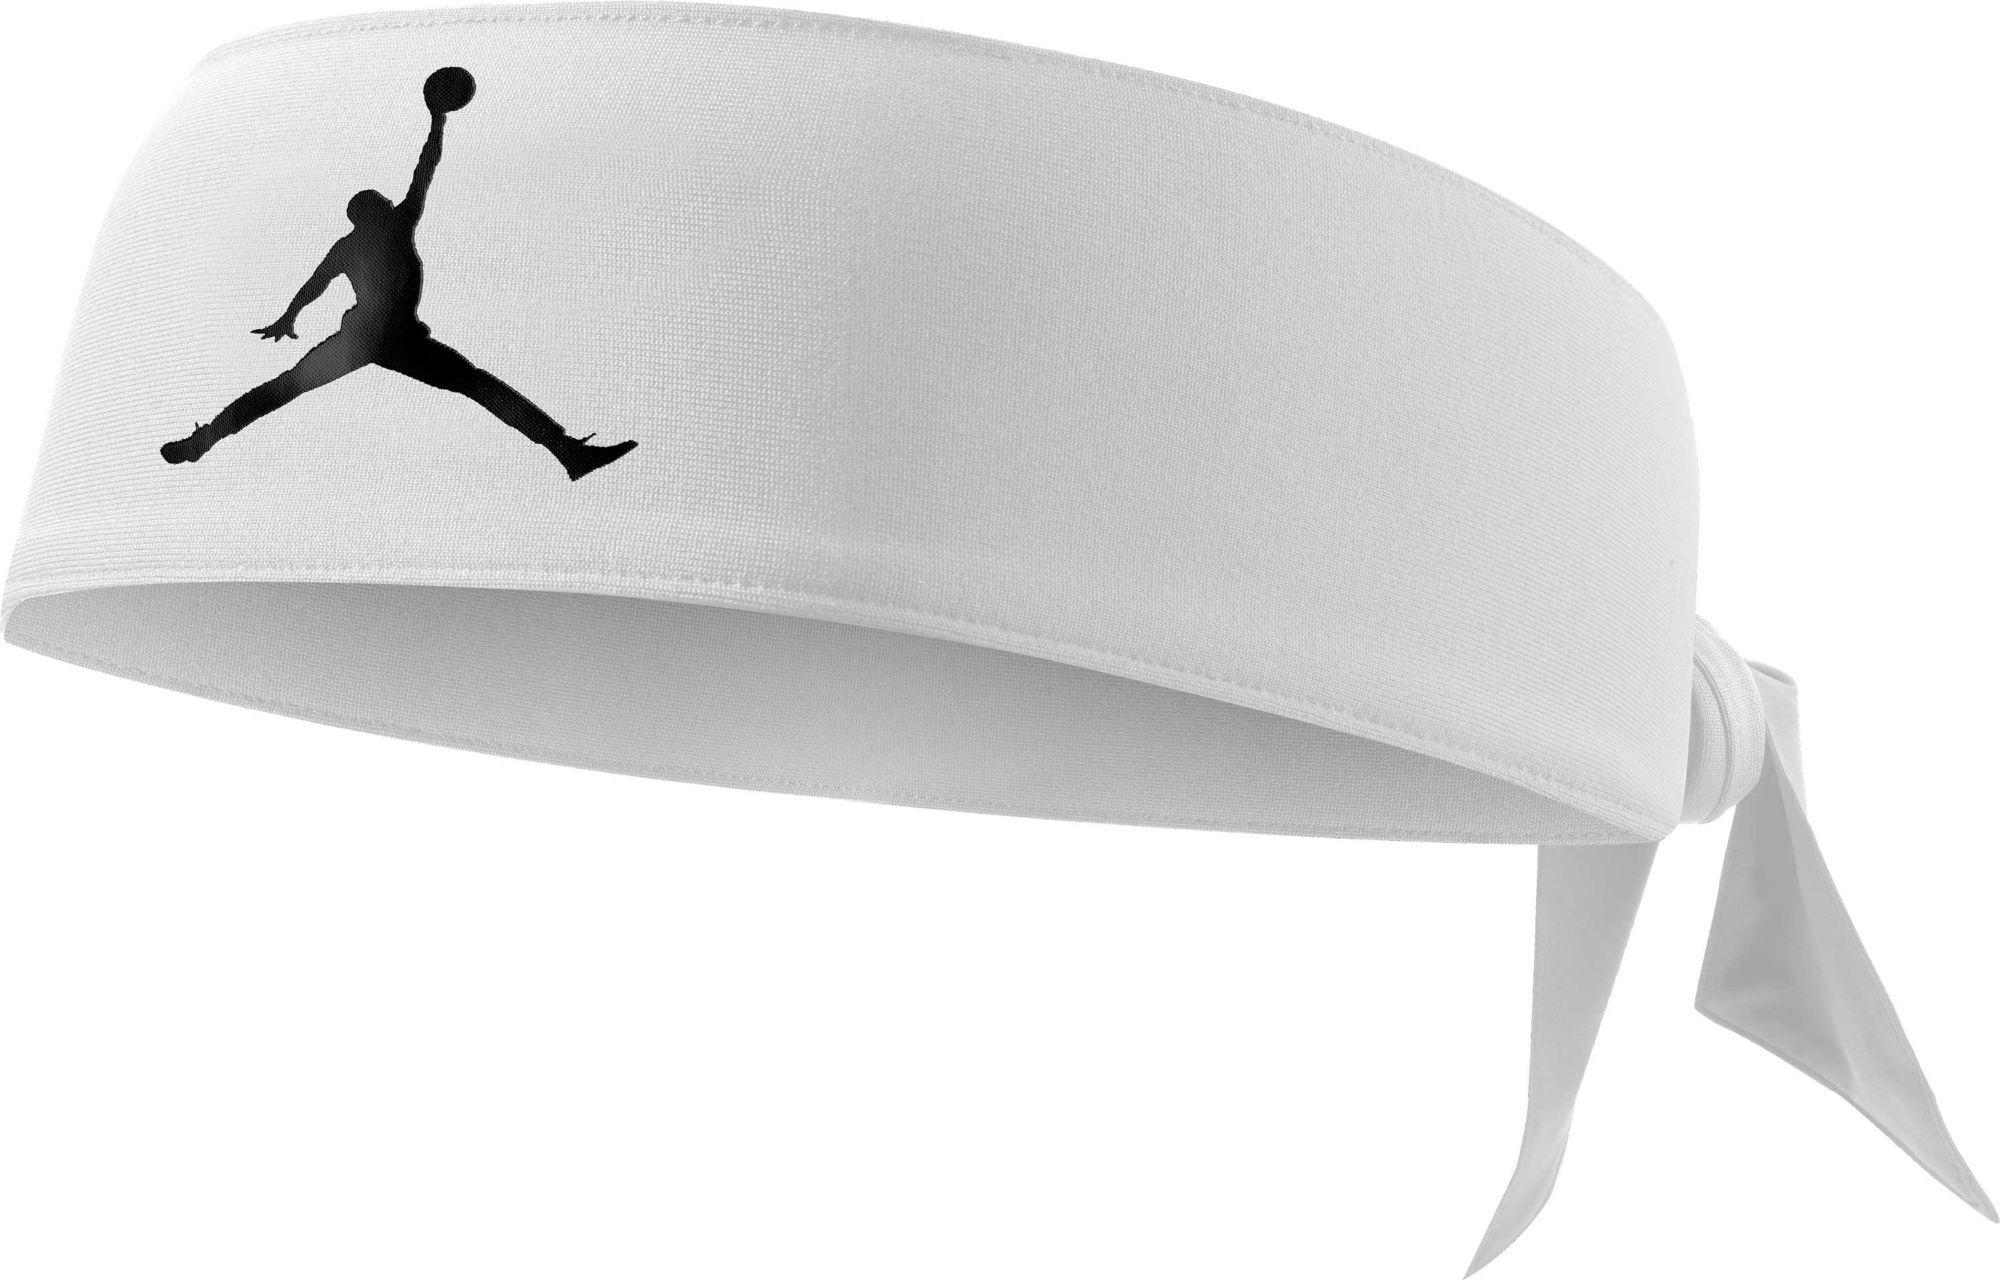 Nike. Men's White Jordan Jumpman Dri-fit Head Tie. $15 From Dick's Sporting  Goods ...